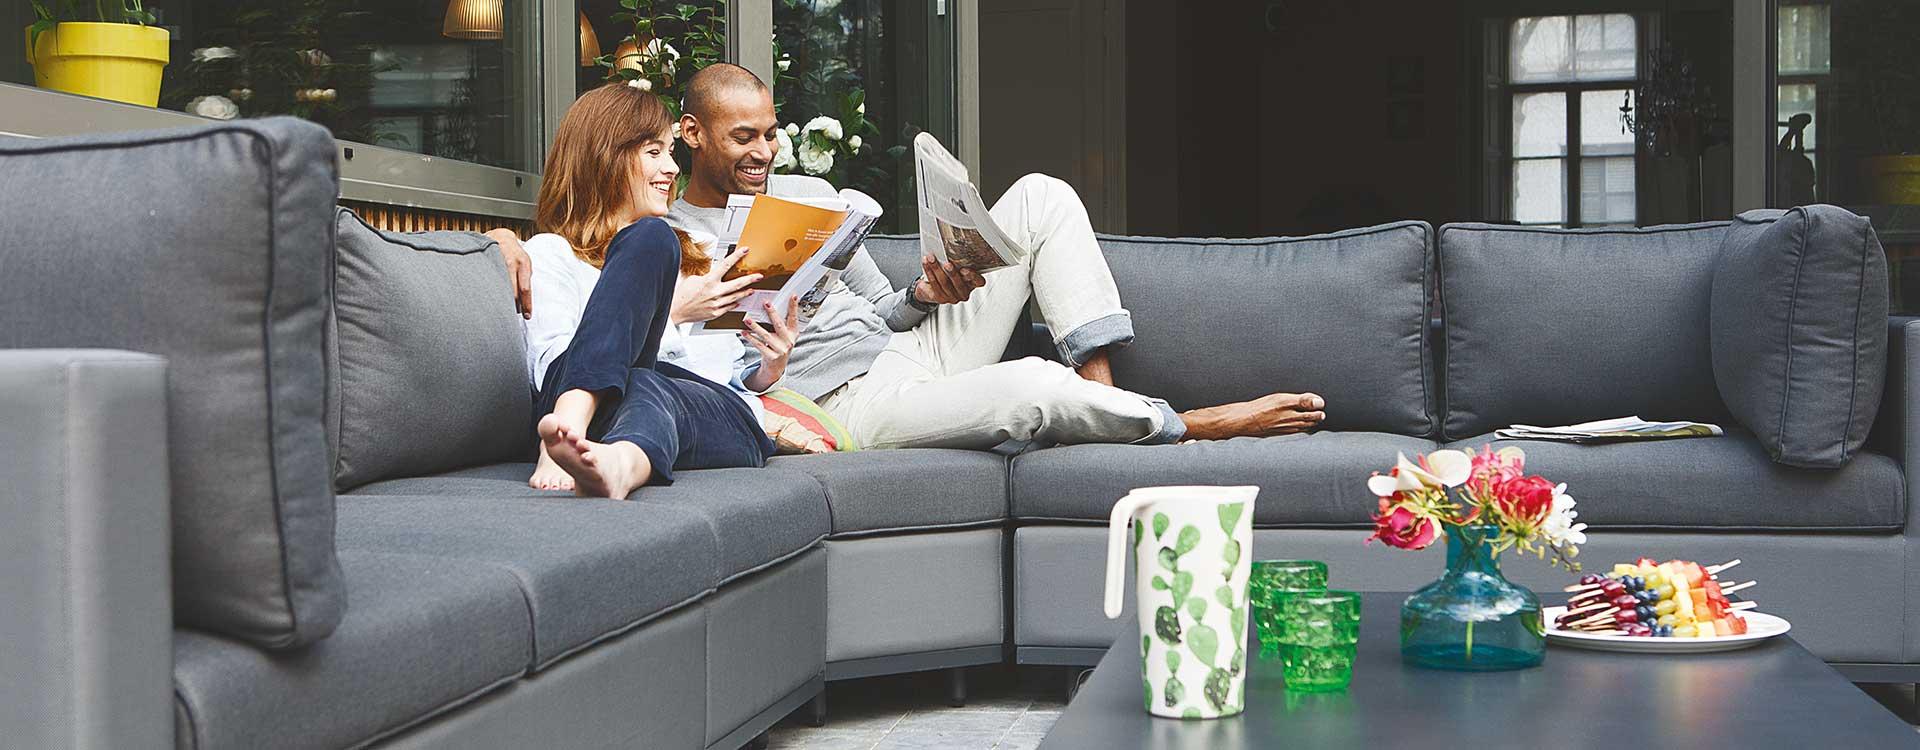 gartenm bel mit anziehungskraft suns gartenm bel. Black Bedroom Furniture Sets. Home Design Ideas